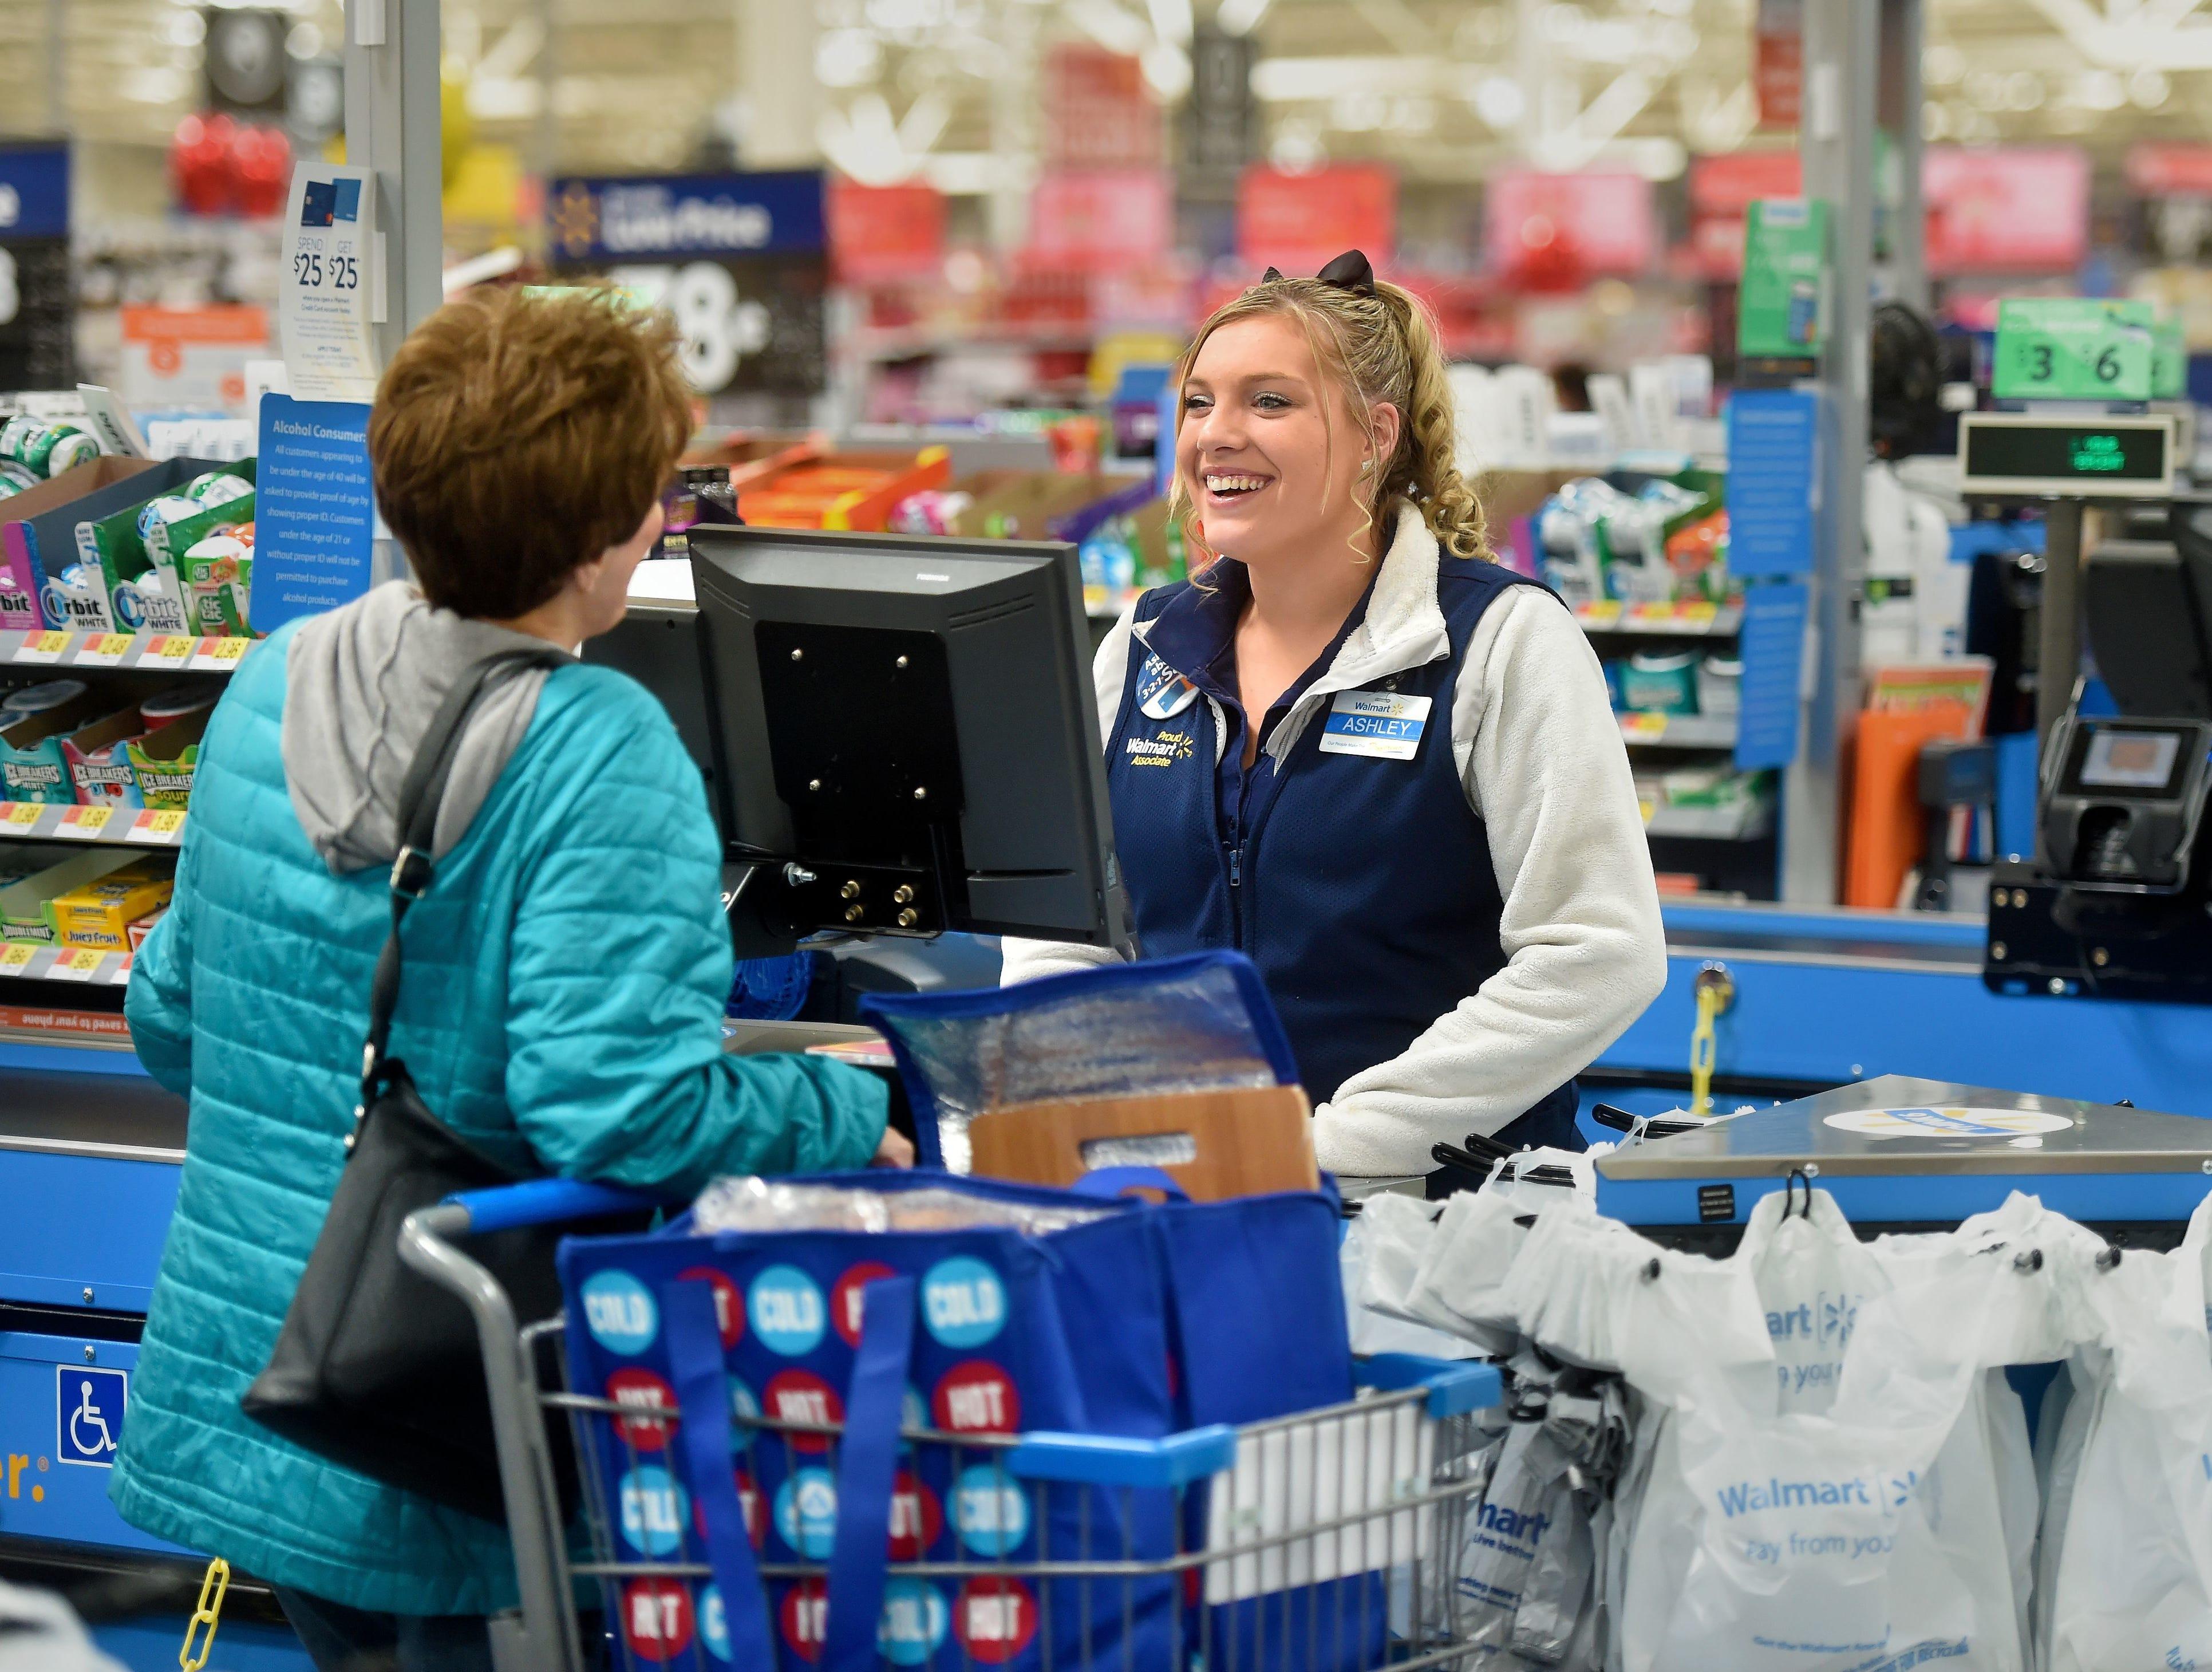 No. 2: Walmart Stores Inc. | Discount department stores | 2019 employees: 34,071 | 2018 employees: 34,300 | Ownership: Public | Headquarters: Bentonville, Arkansas | www.walmart.com